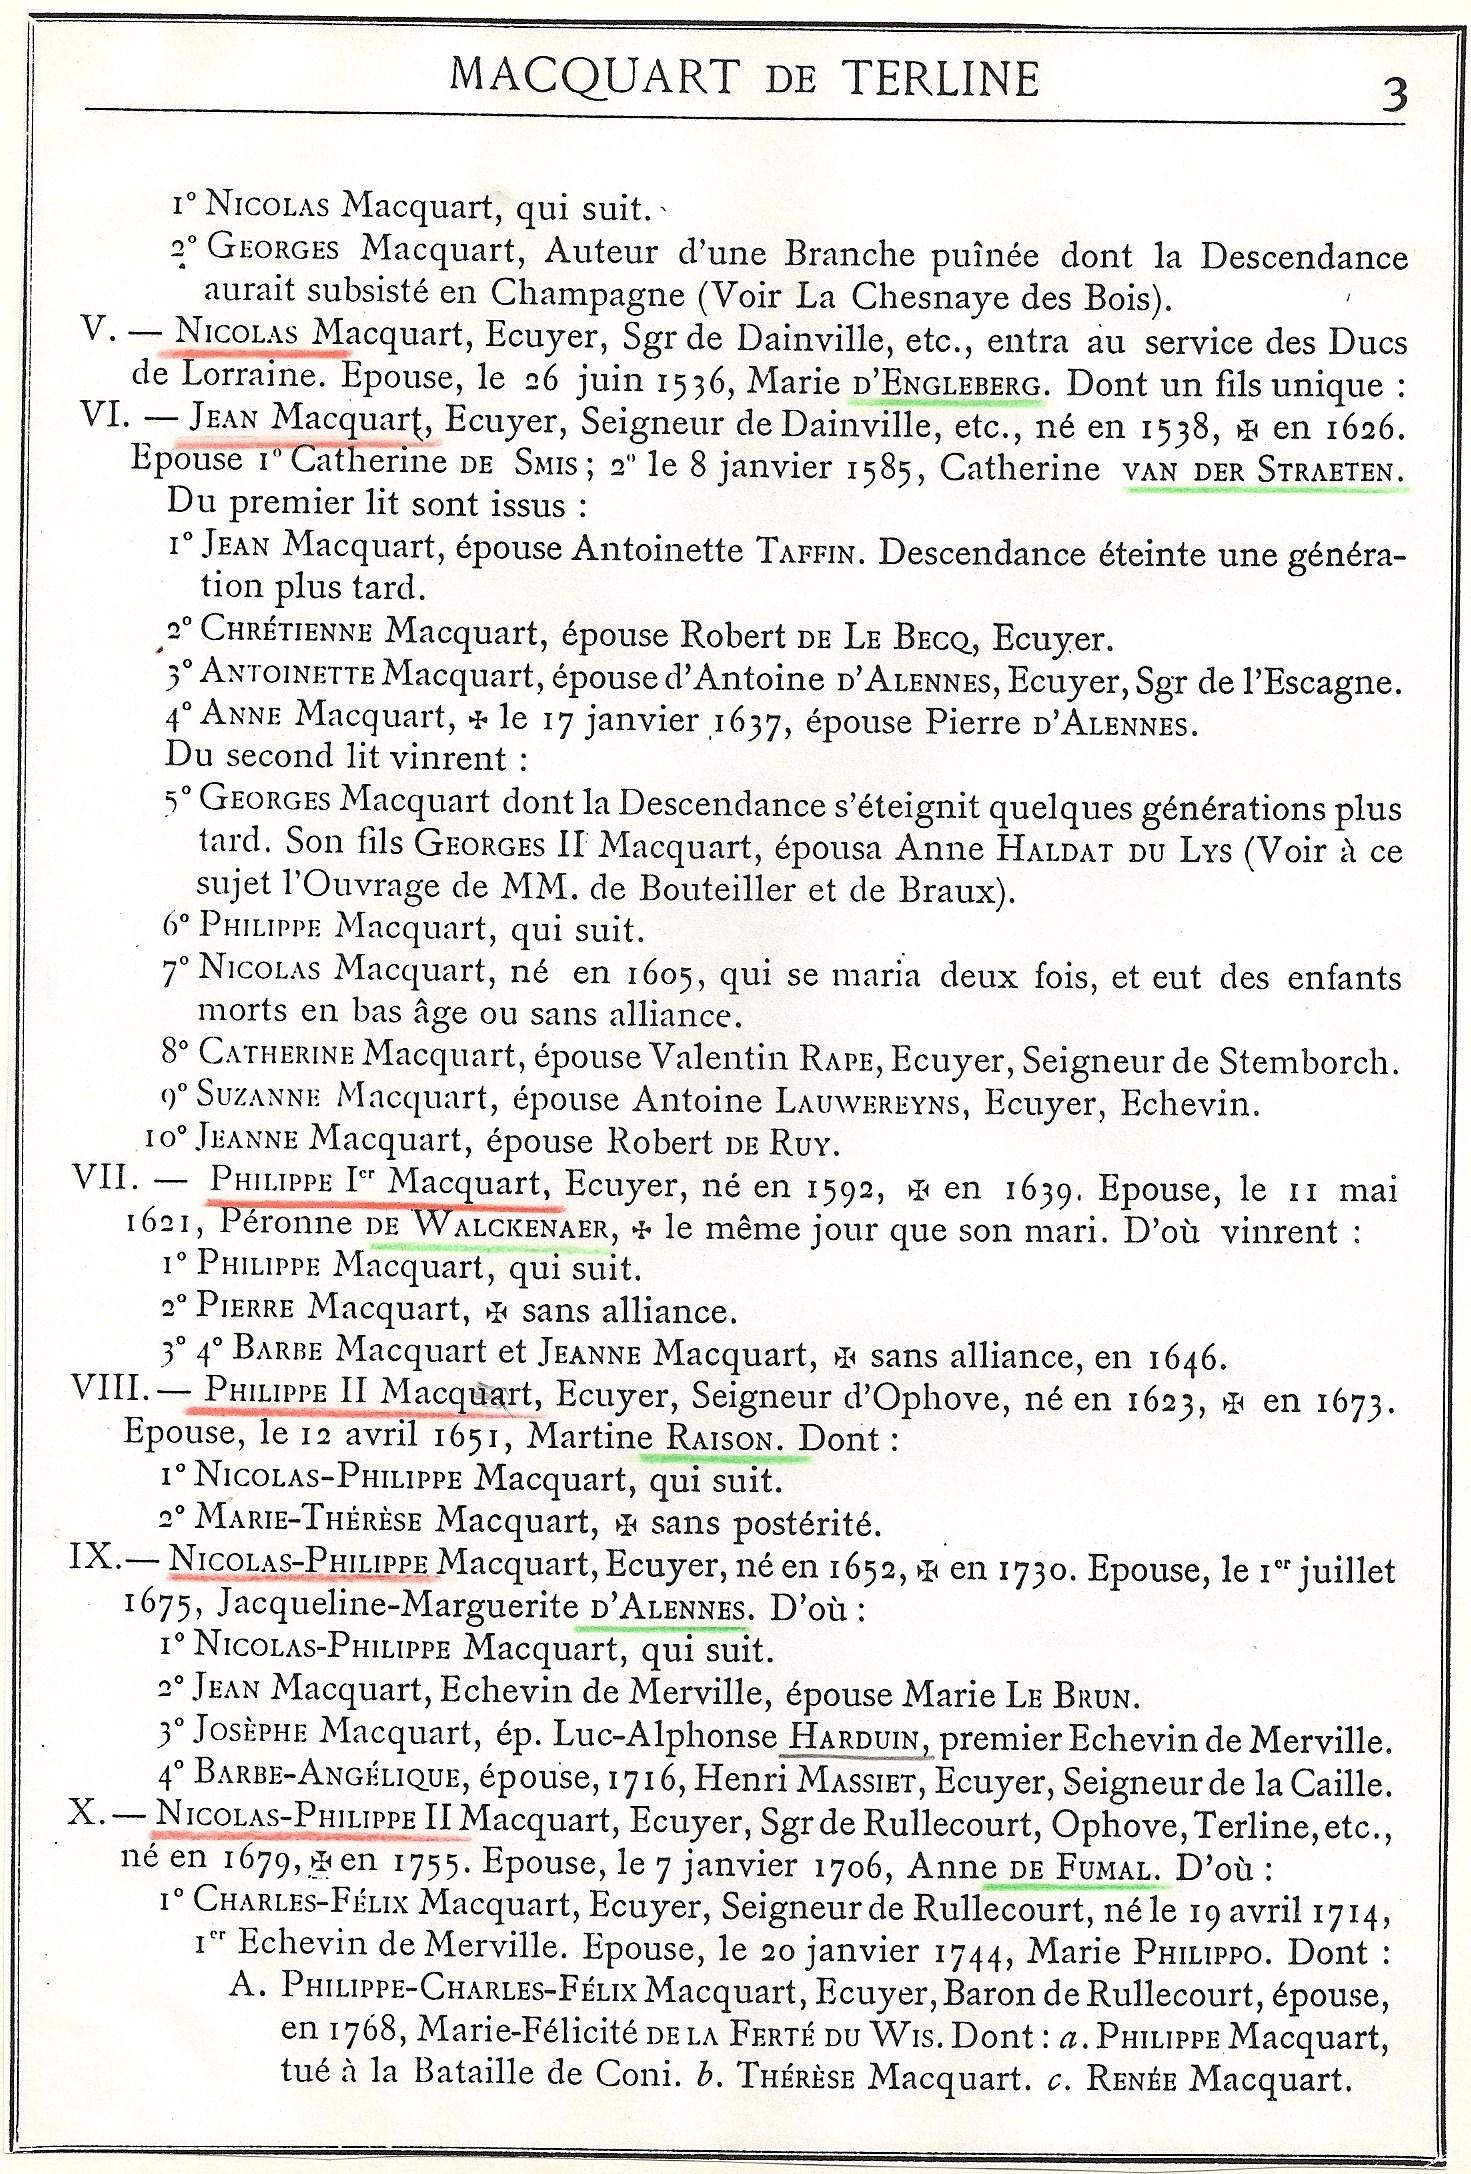 Macquart-de-Terline3